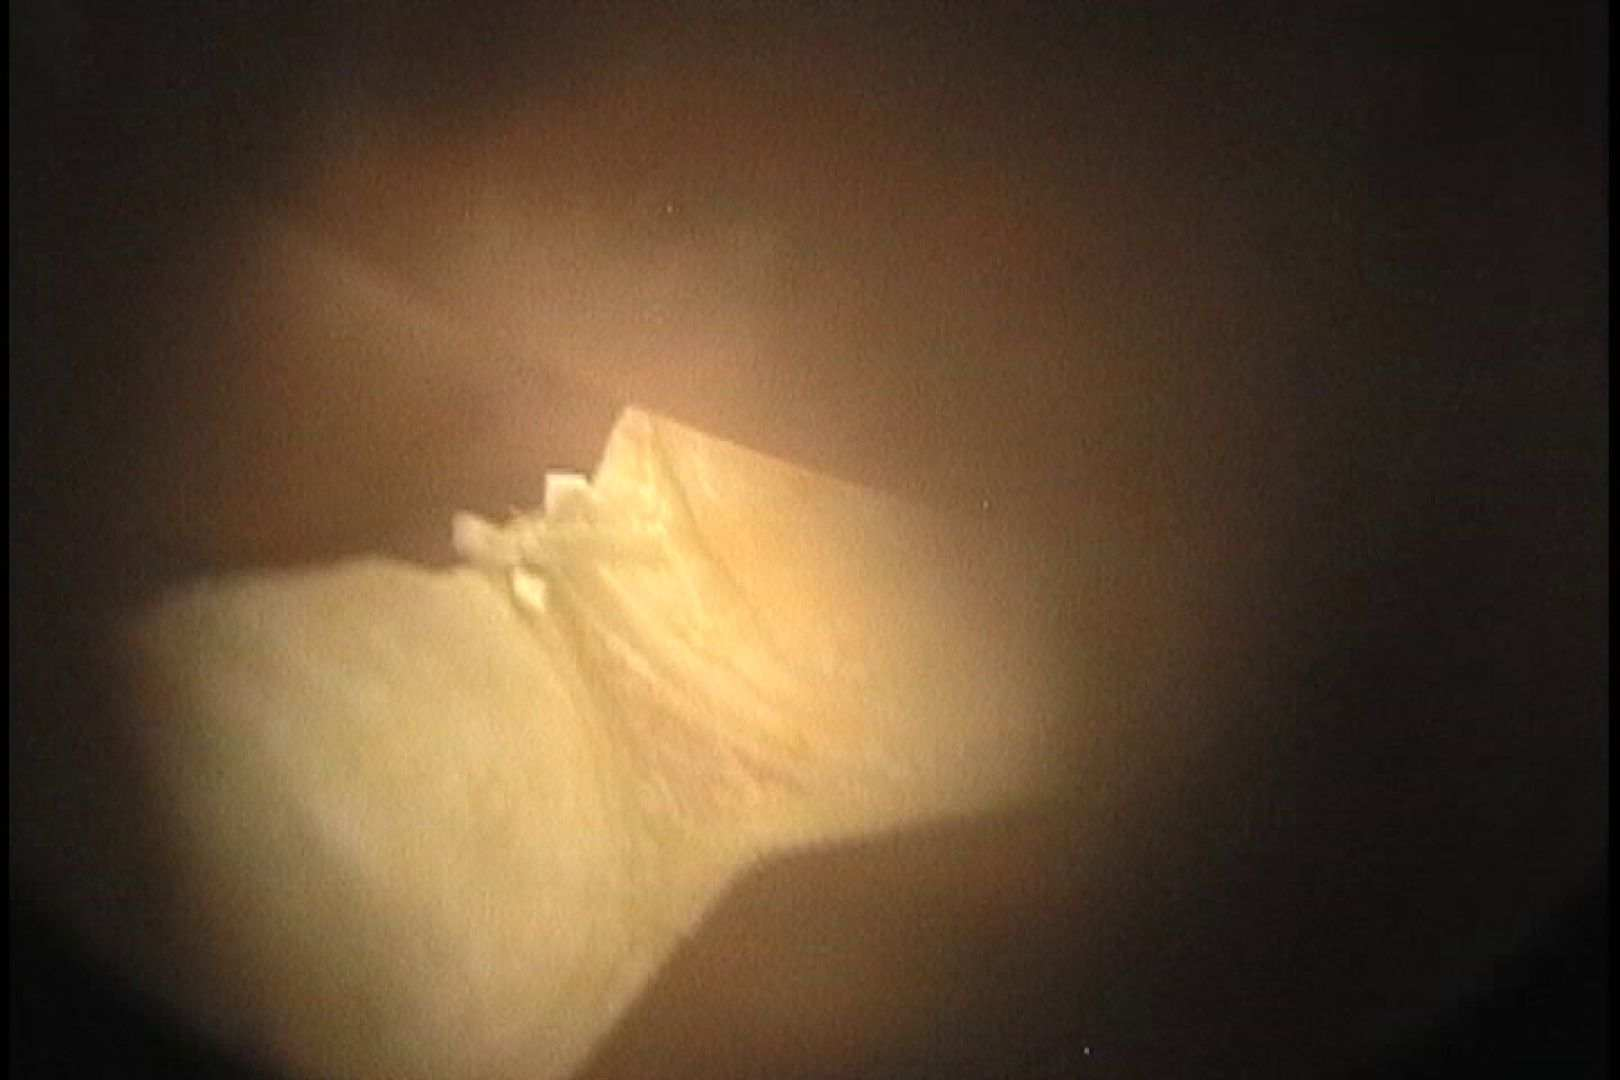 No.27 ロケットオッパイ、モジャモジャの奥に薄っすらとスジが! 接写  55PIX 49